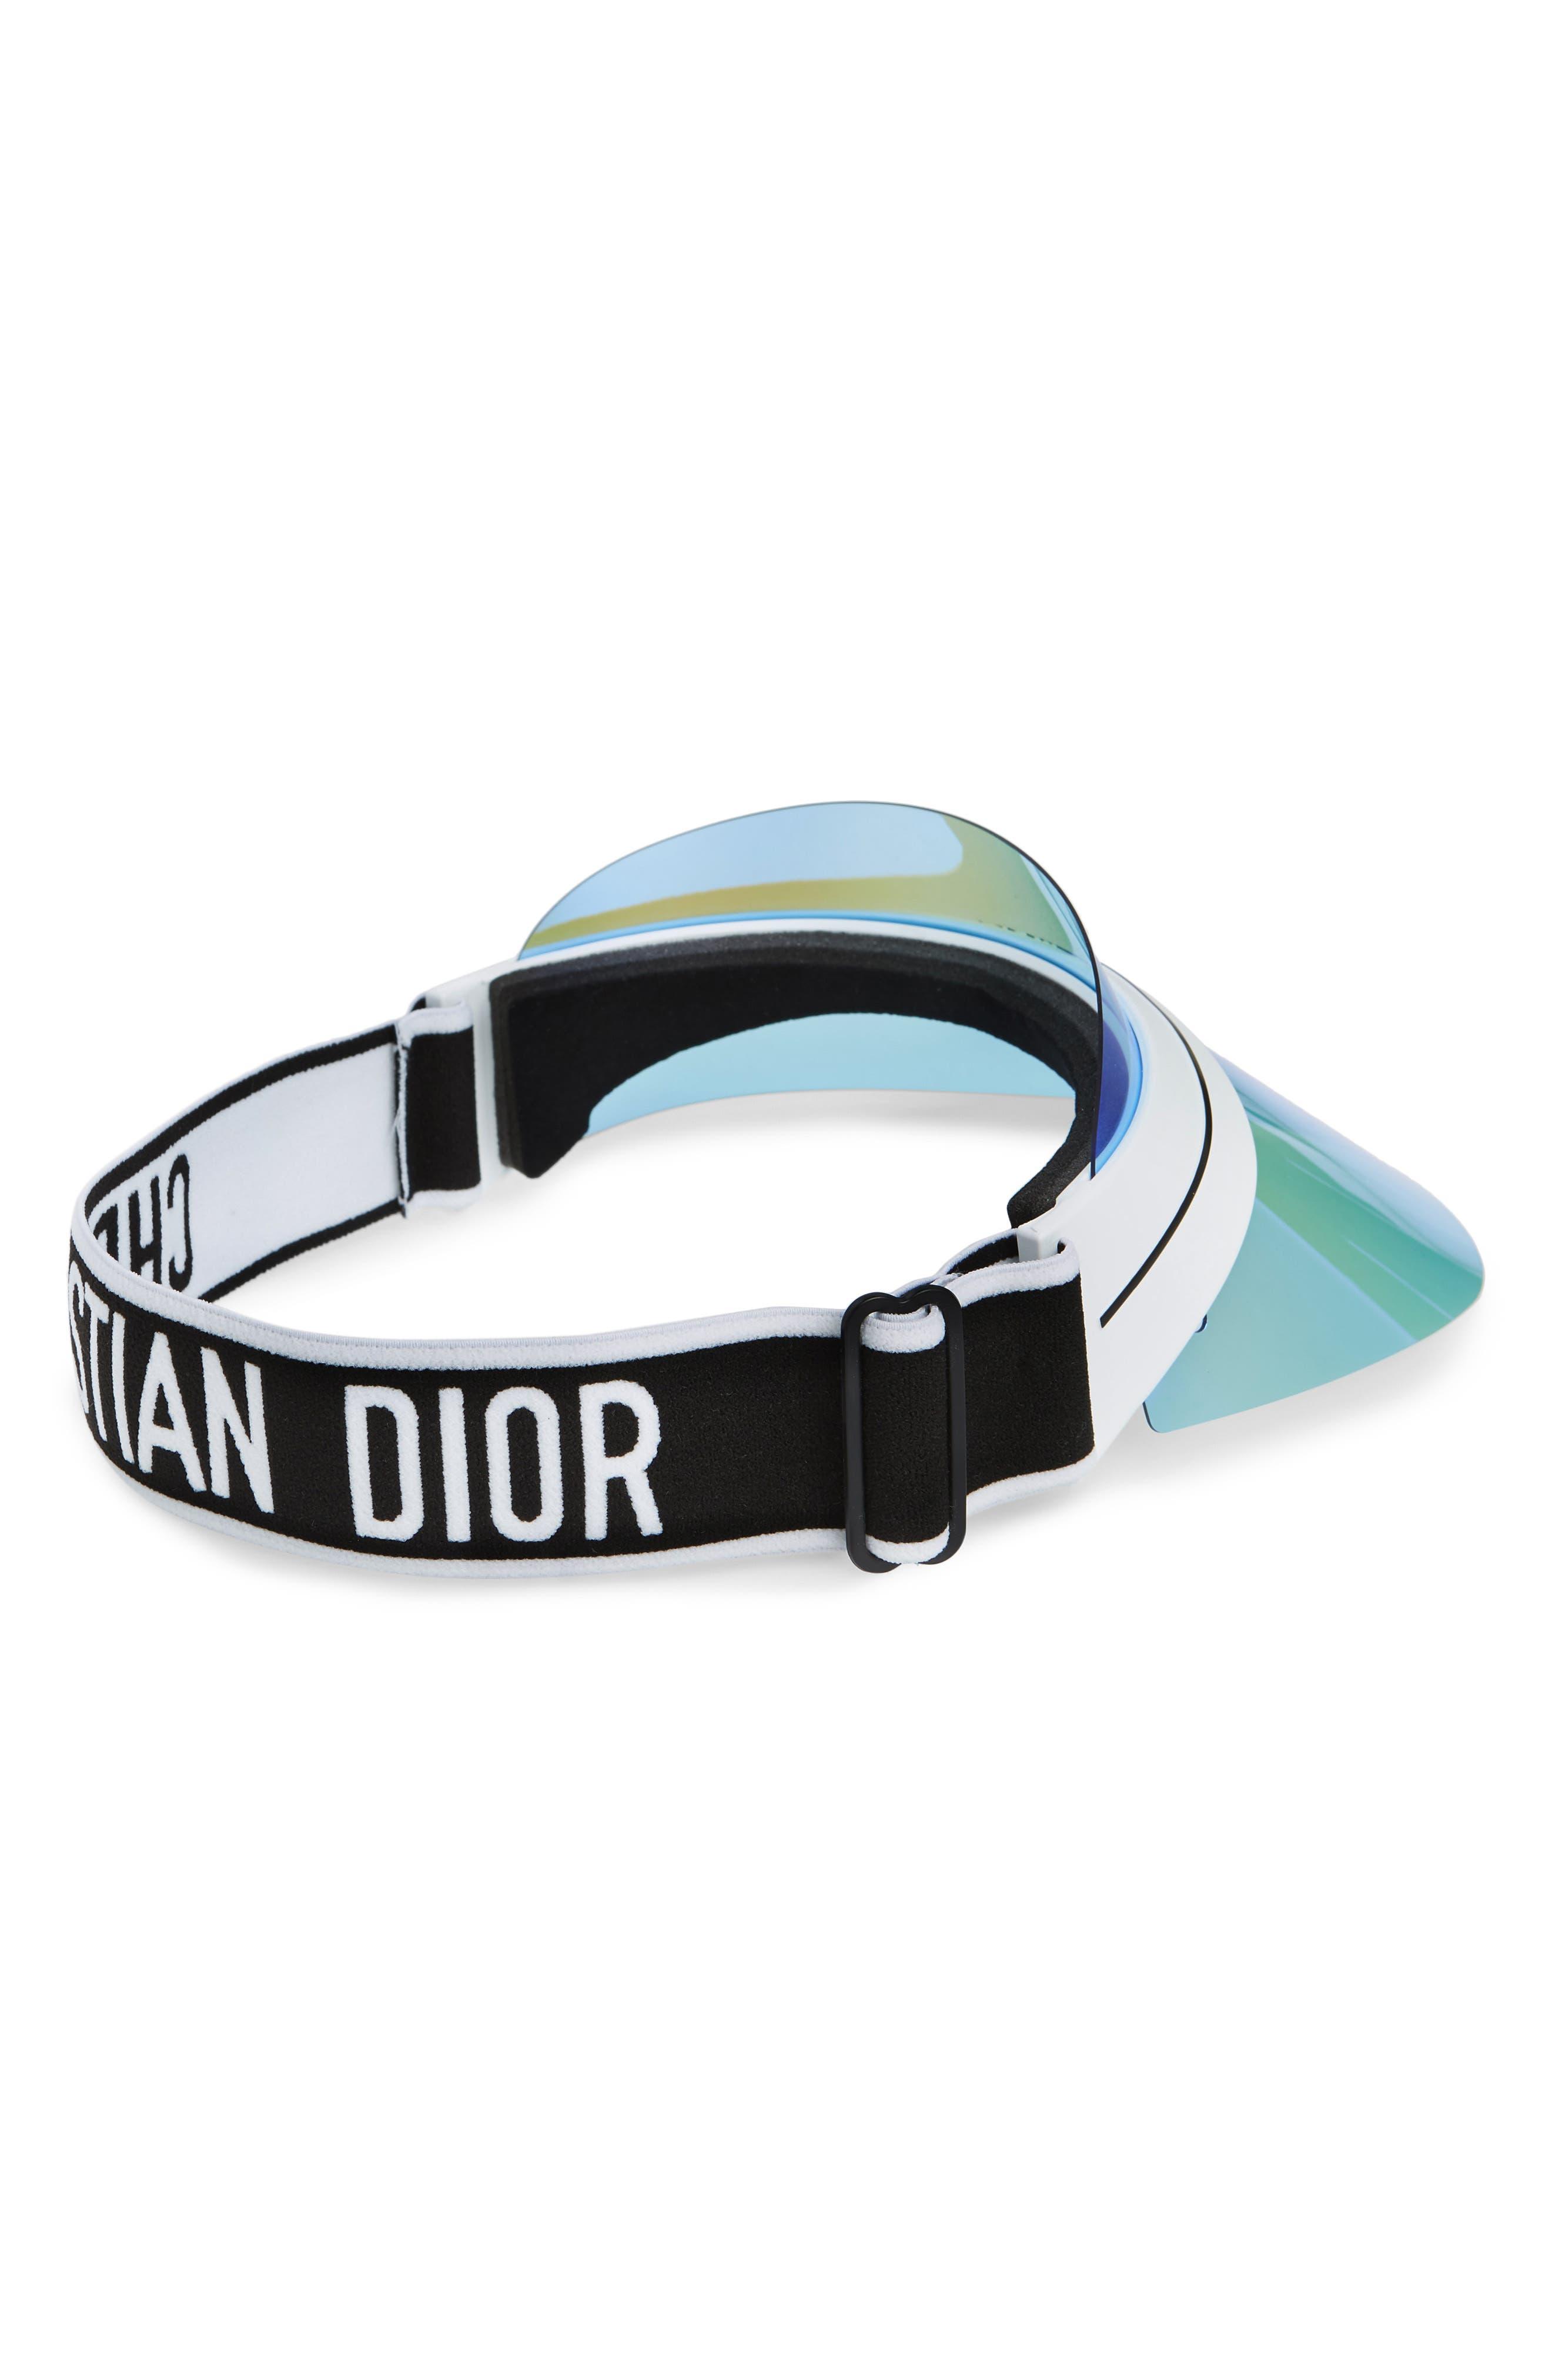 DiorClub1 Visor,                             Alternate thumbnail 2, color,                             METALLIC BLUE/ GUNMETAL